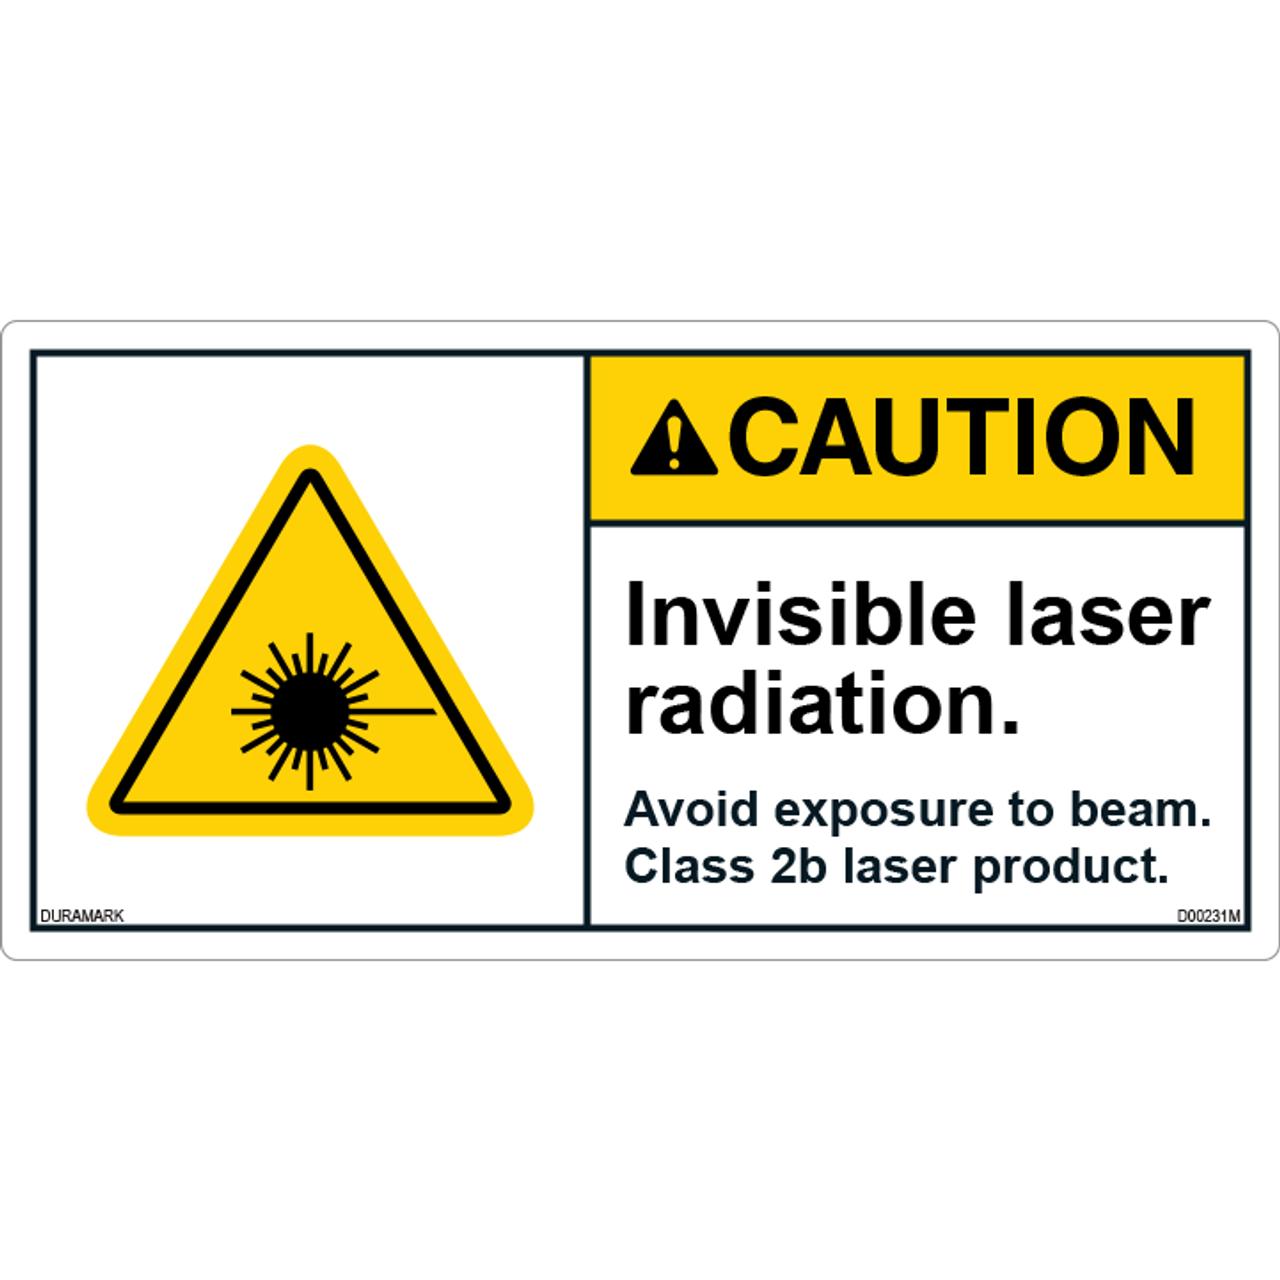 ANSI Safety Label - Caution - Laser Radiation - Class 2B